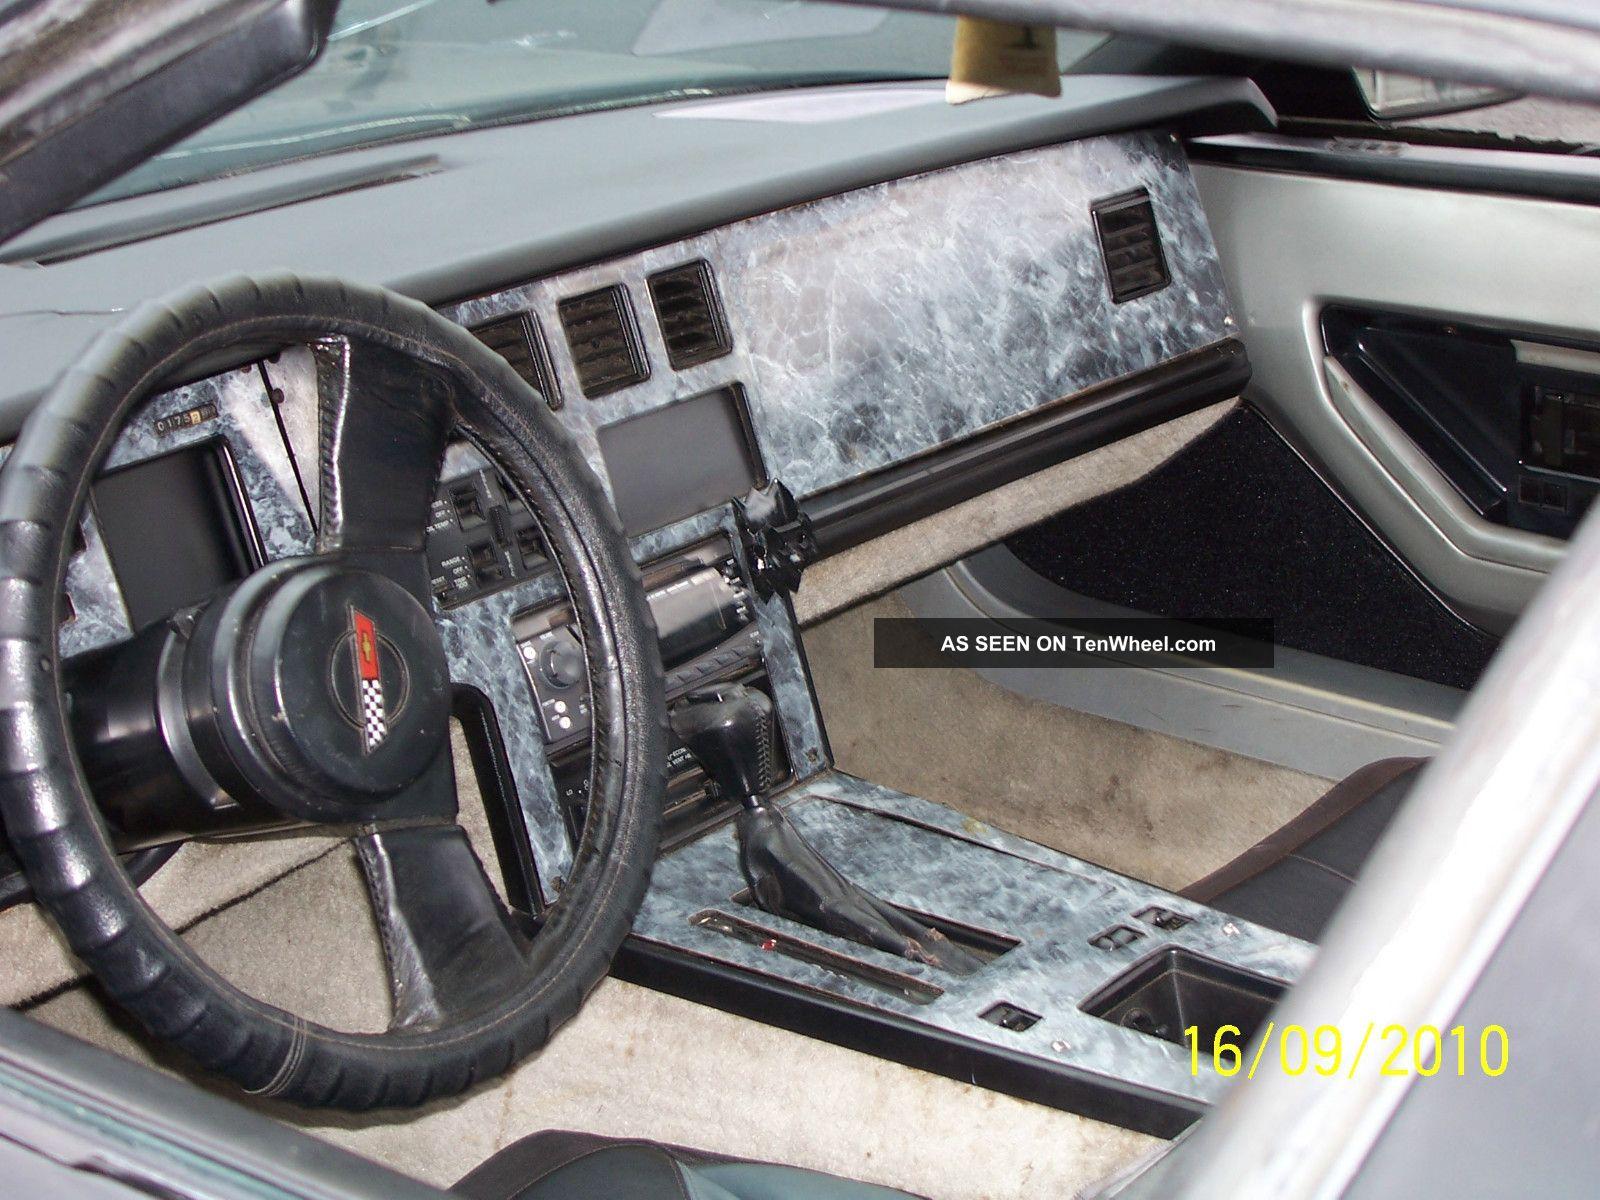 1984 Corvette Coup Rebuilt Motor Black Paint Some Interior Black Grey